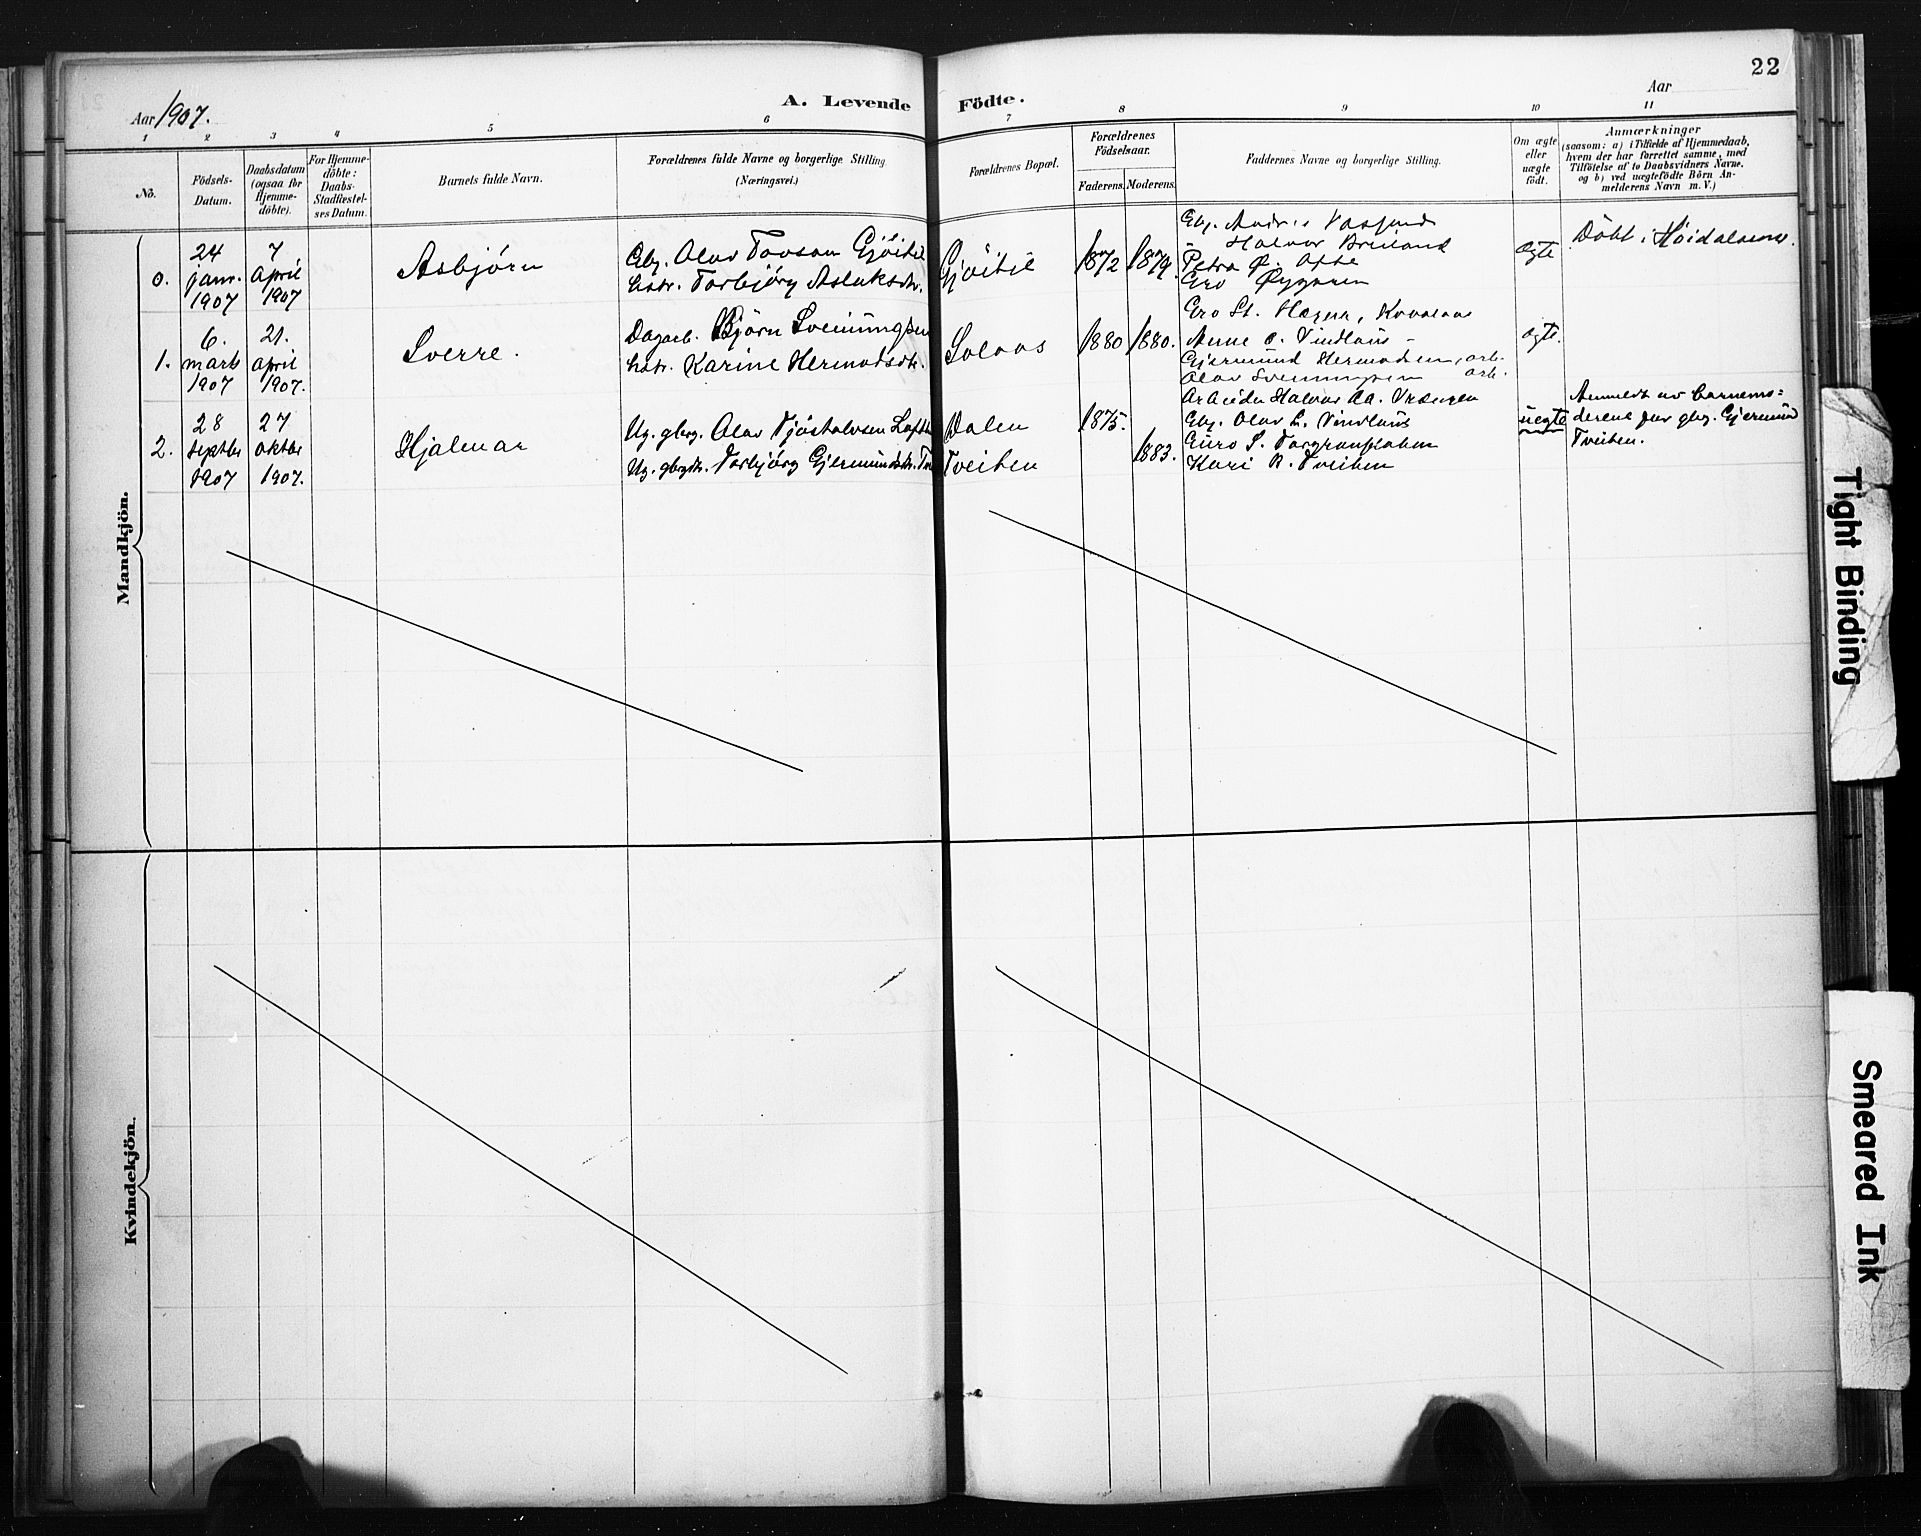 SAKO, Lårdal kirkebøker, F/Fb/L0002: Ministerialbok nr. II 2, 1887-1918, s. 22